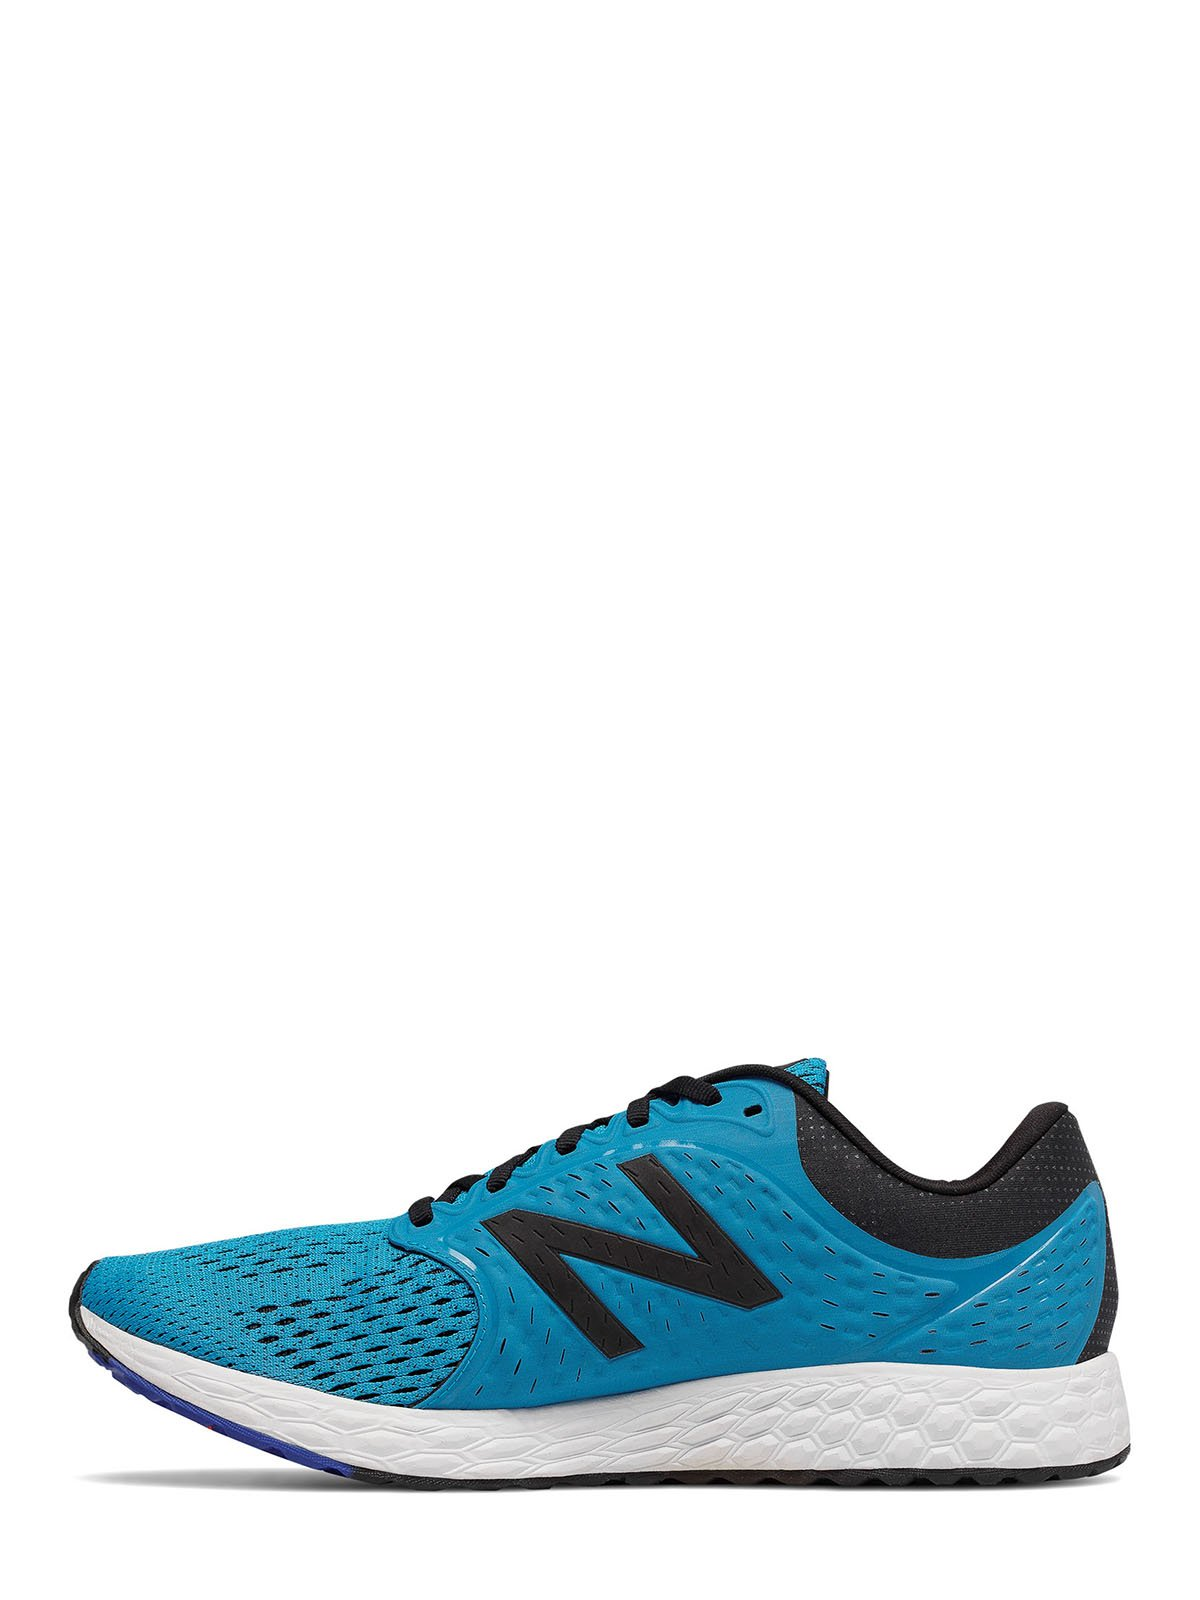 Кросівки блакитні Fresh Foam Zante v4 | 4042483 | фото 2